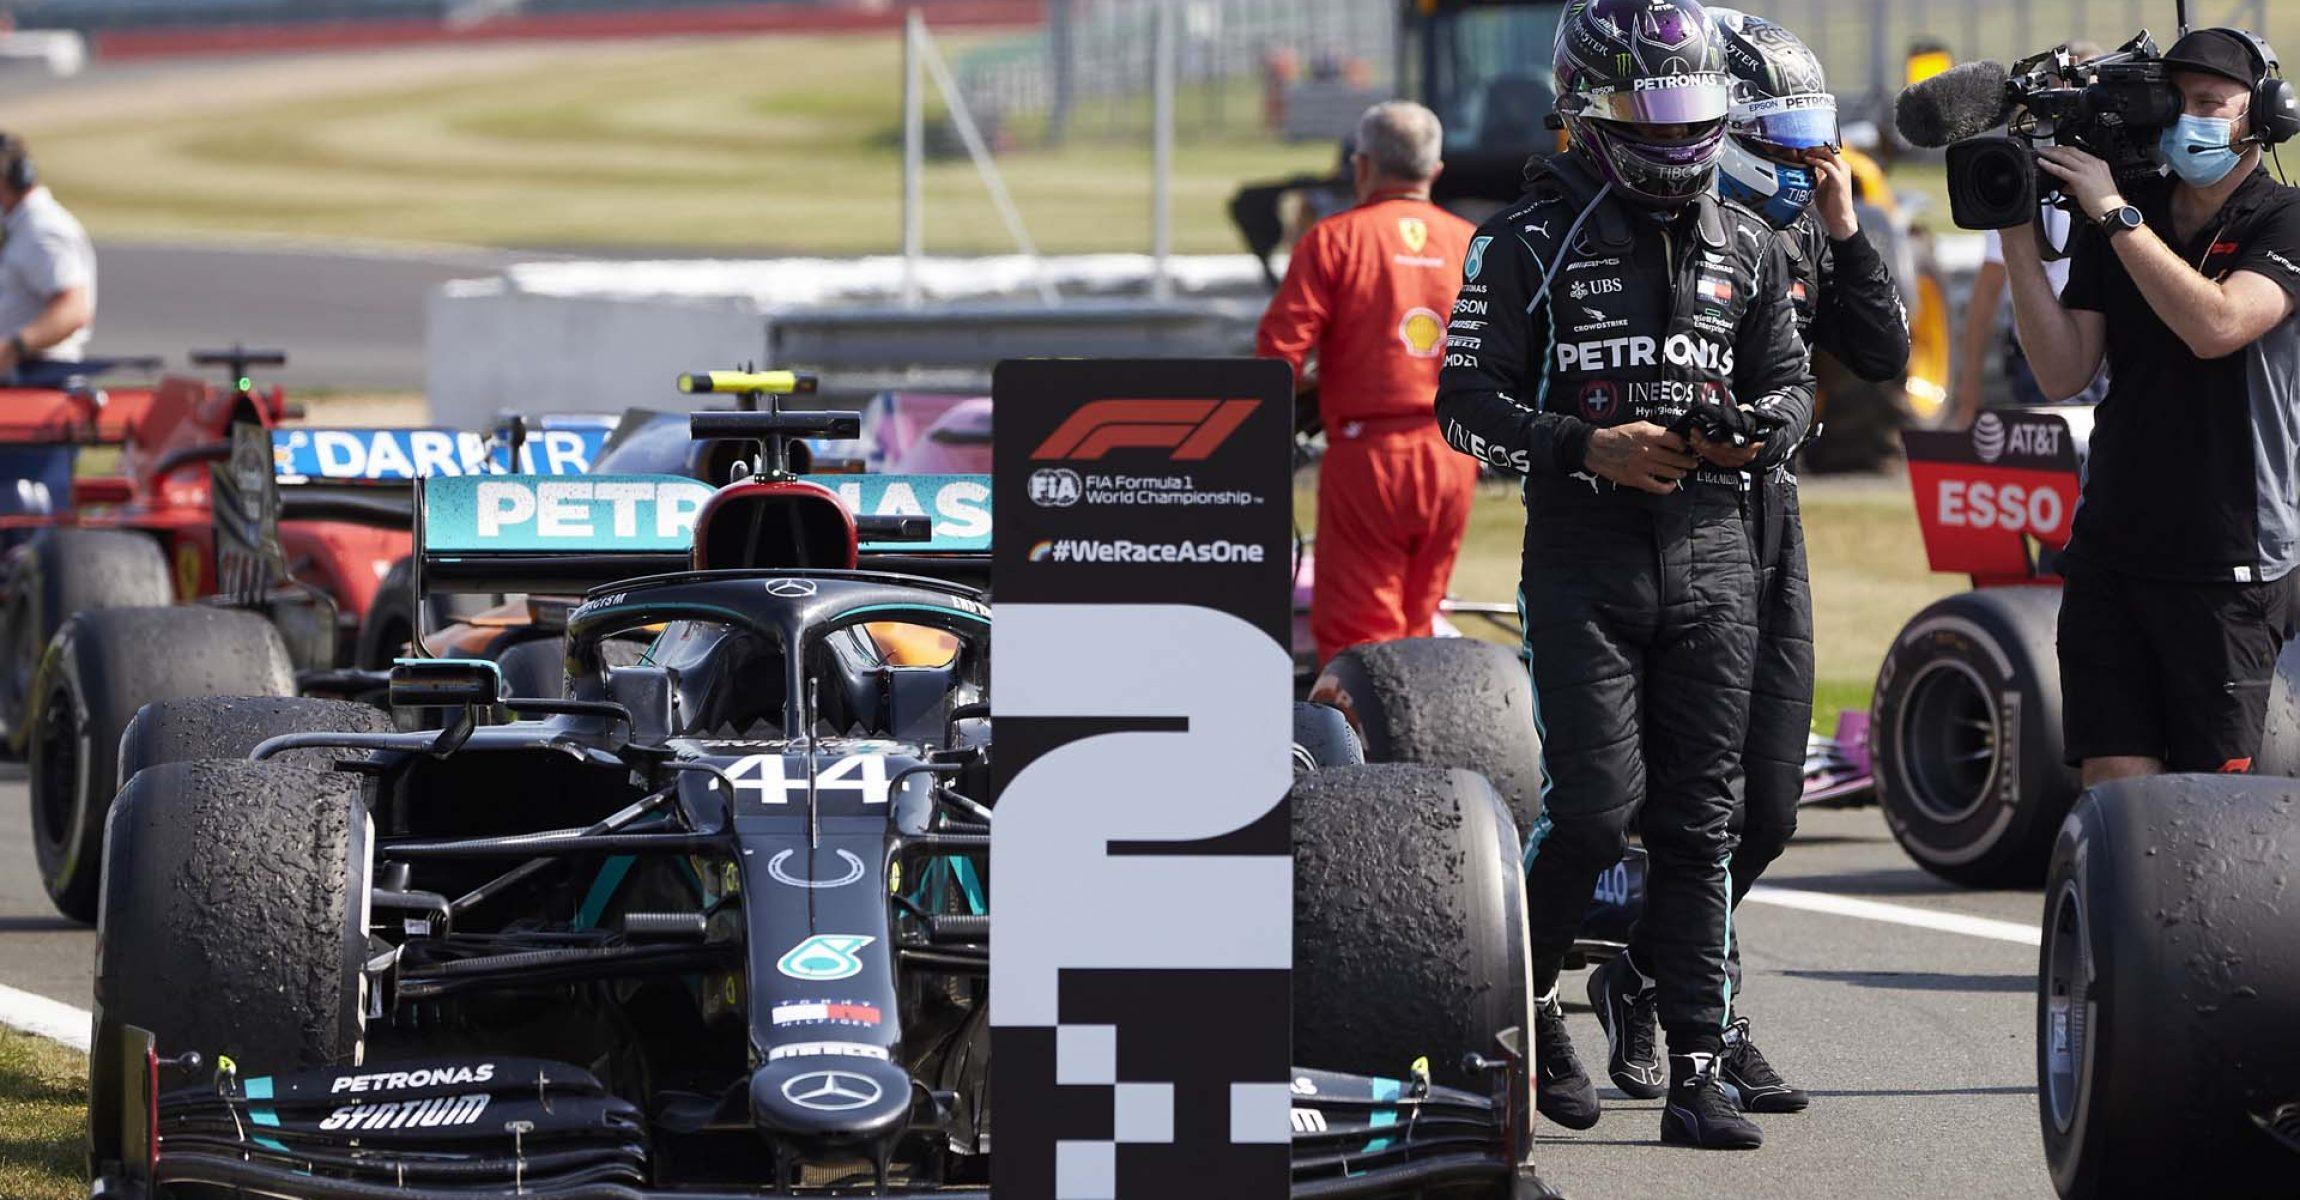 2020 70th Anniversary Grand Prix, Sunday - Steve Etherington Lewis Hamilton Mercedes